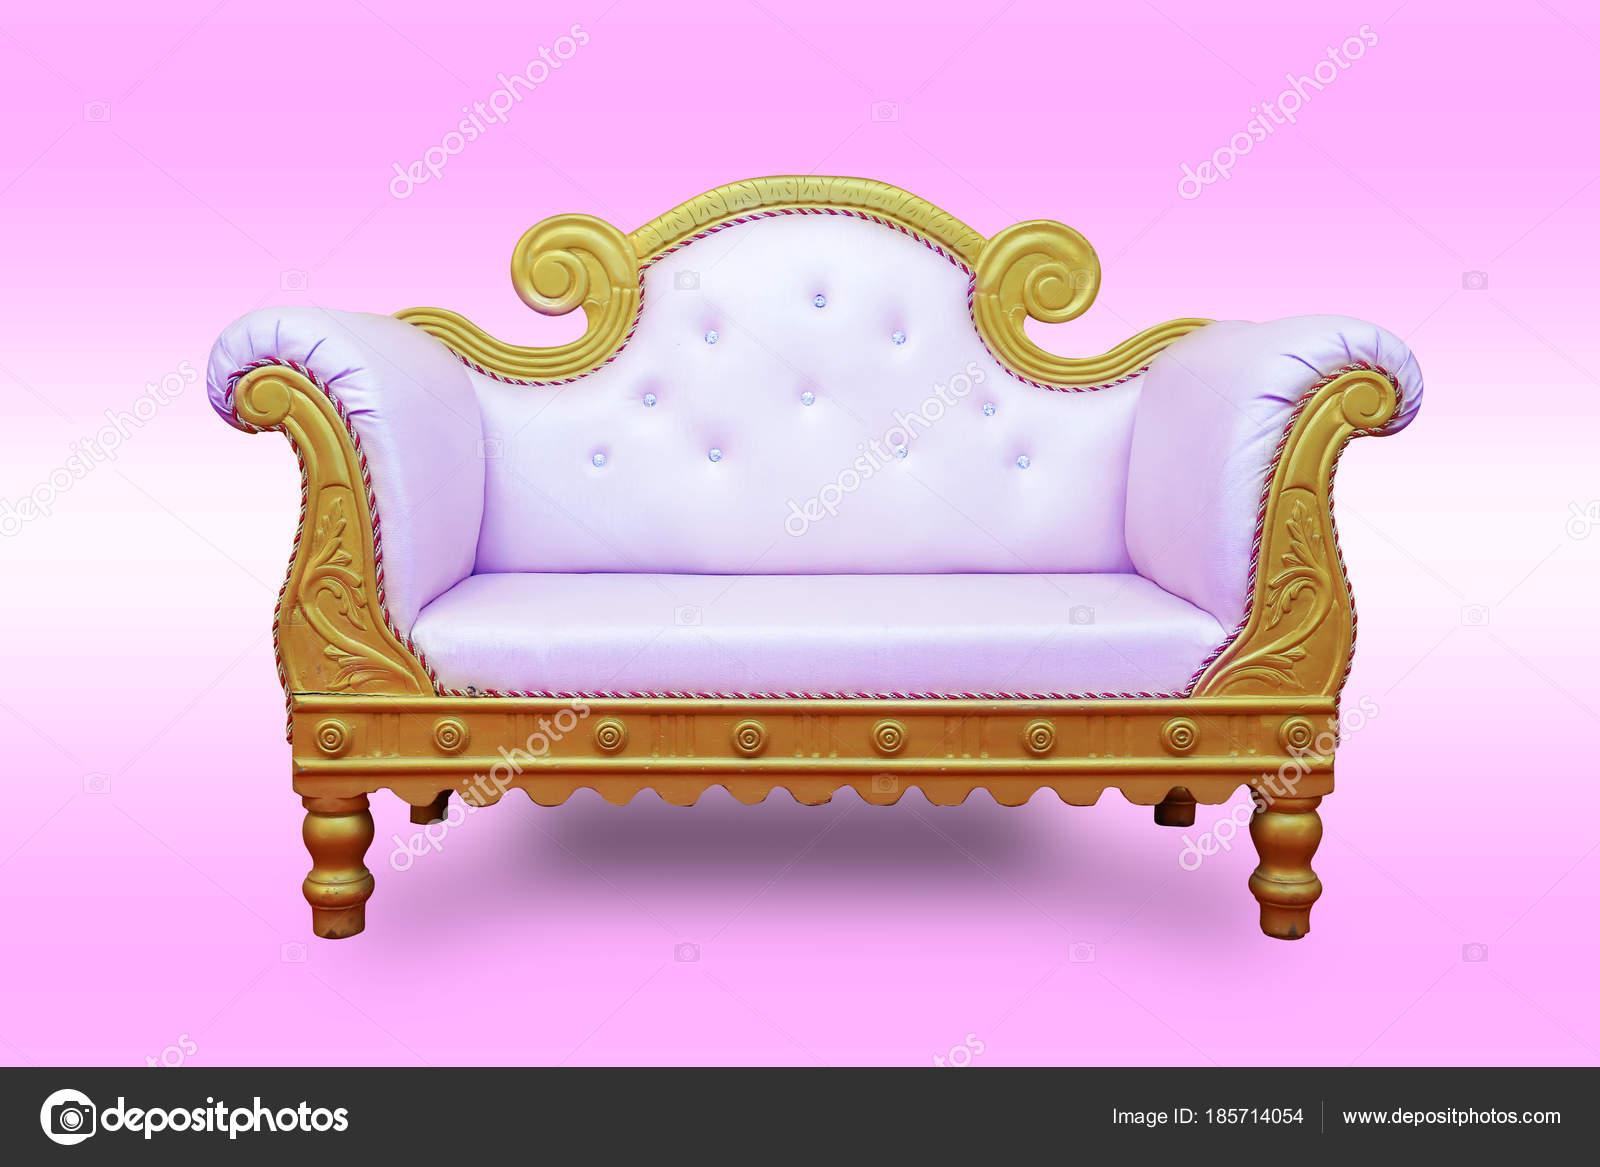 wedding sofa rowe martin sleeper luxury stage on pink background set chairs stock photo